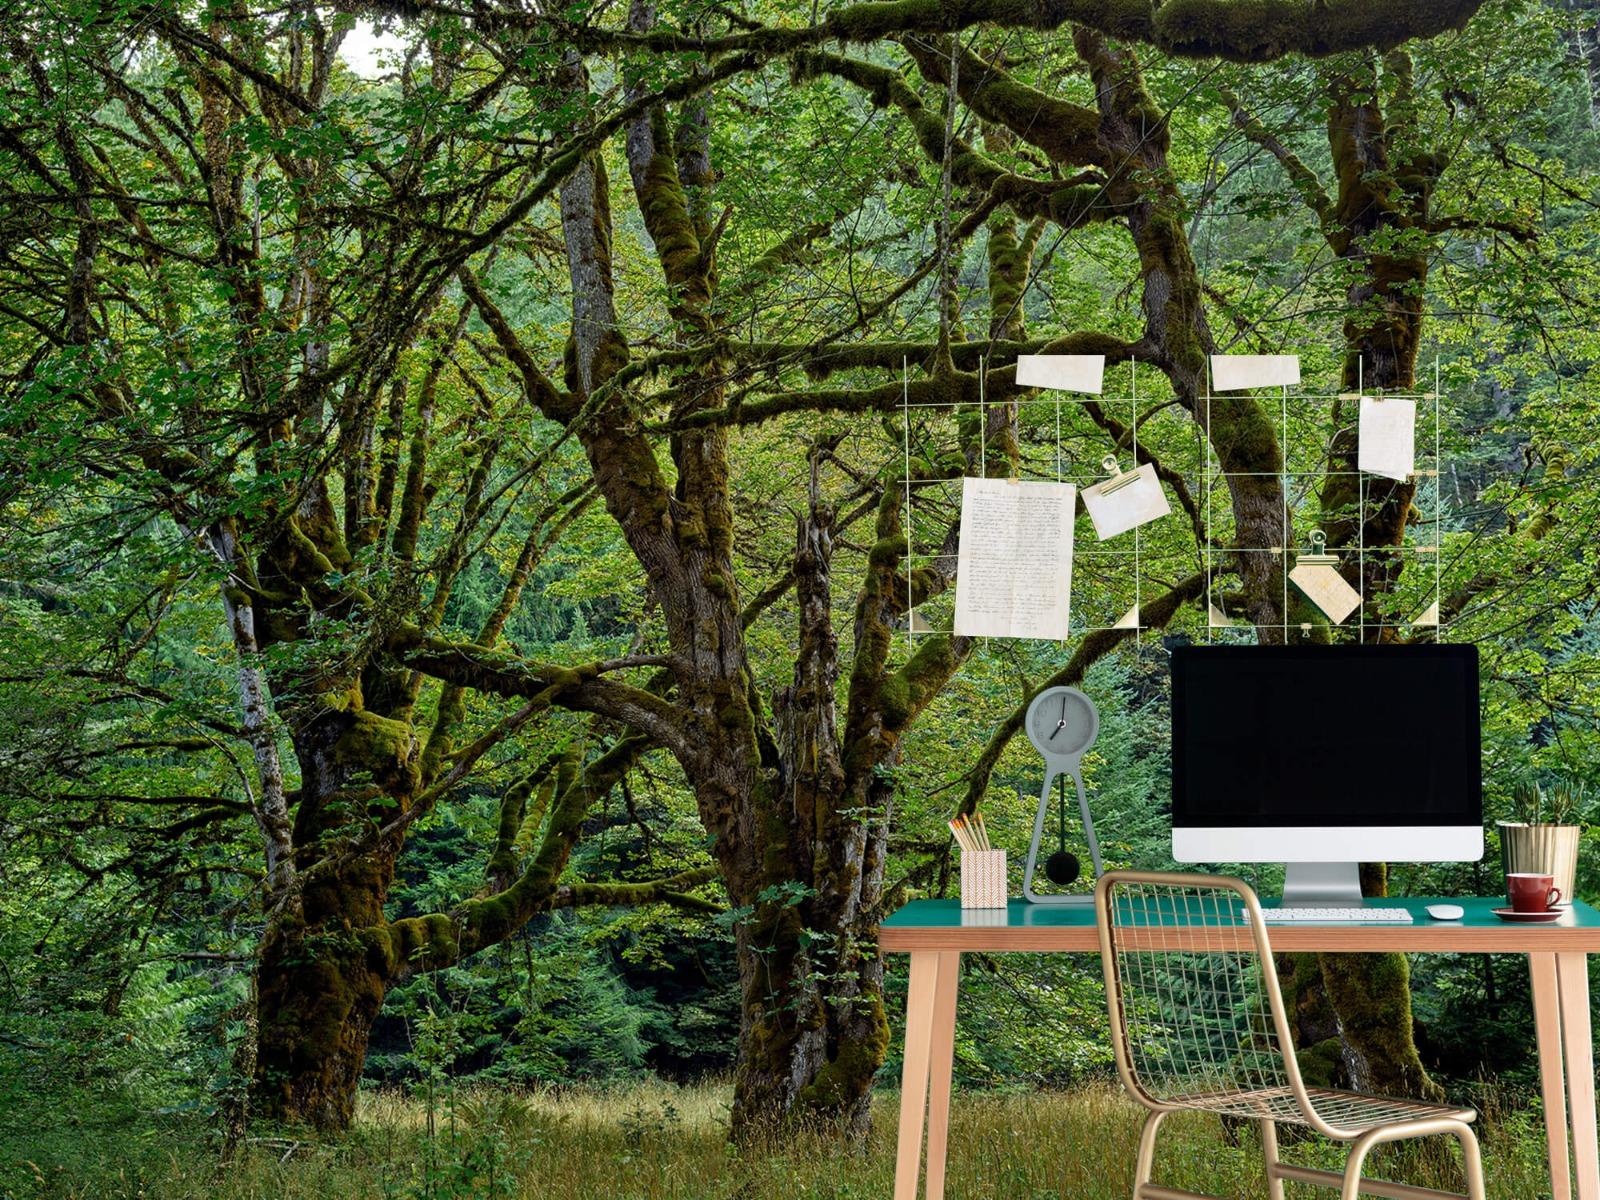 Bomen - Oude bomen - Wallexclusive - Slaapkamer 8